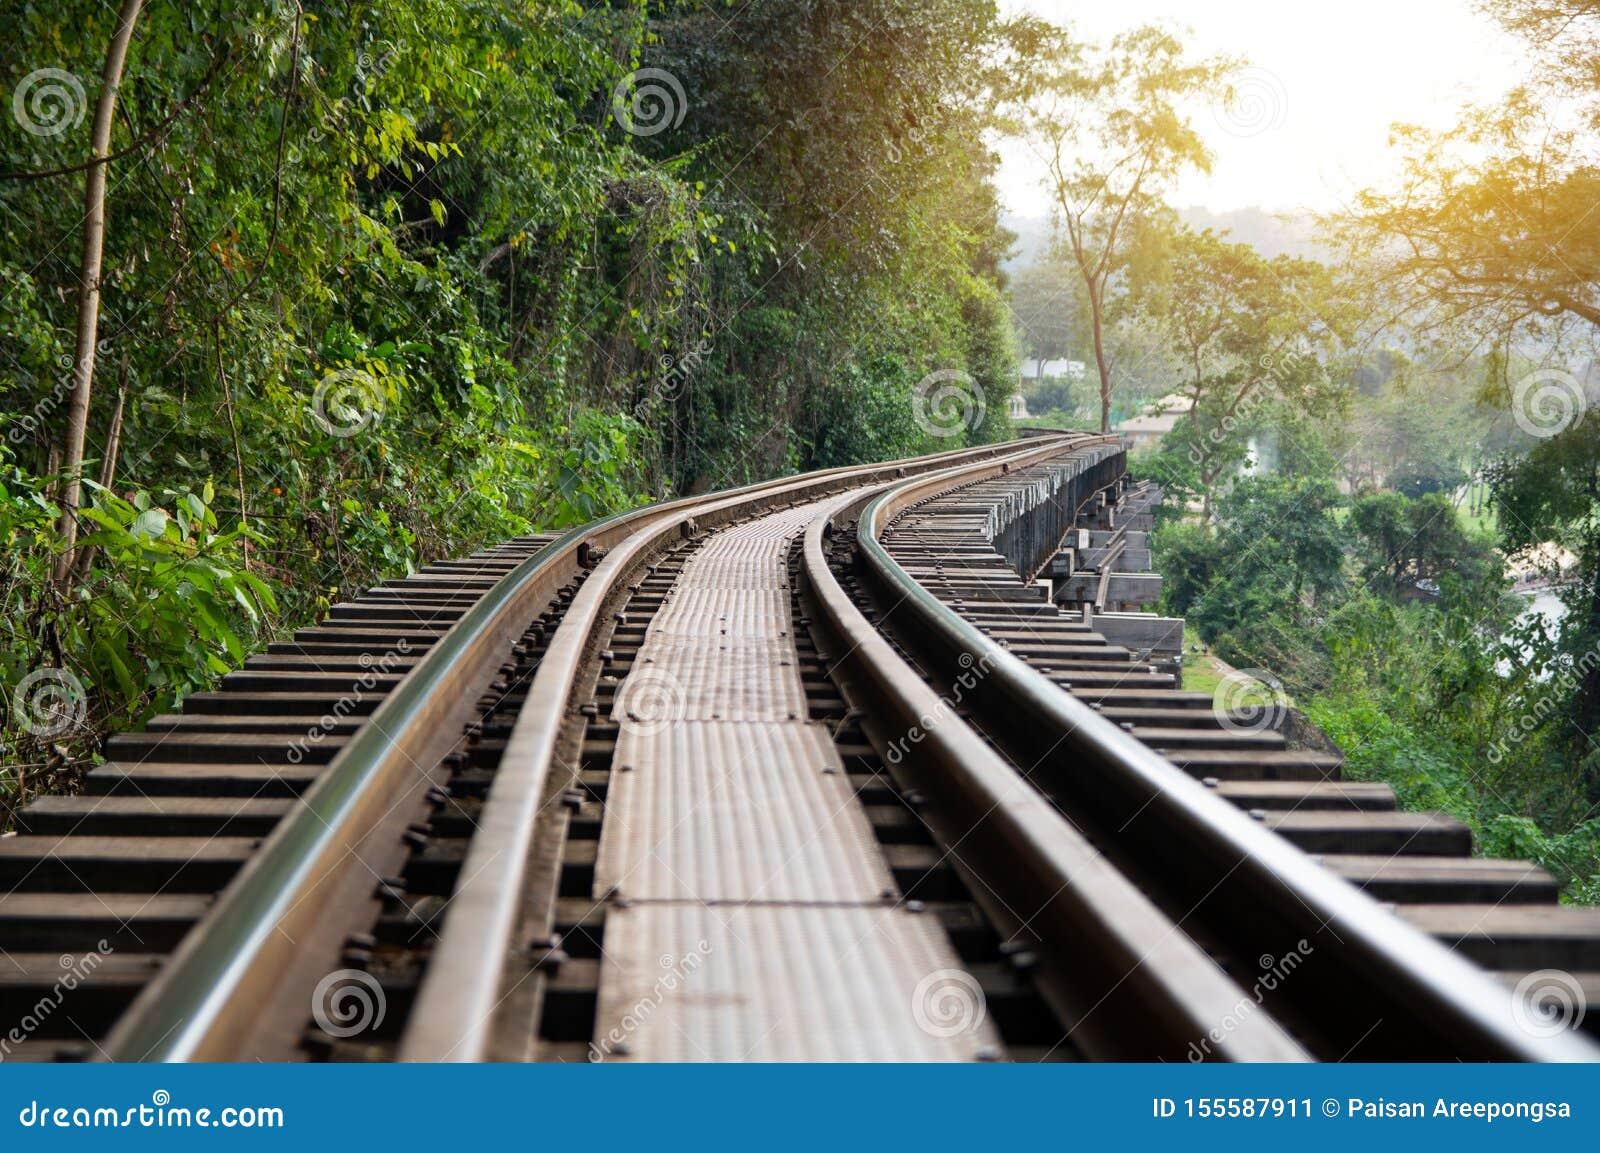 Death railway built during World War II, Kanchanaburi Thailand